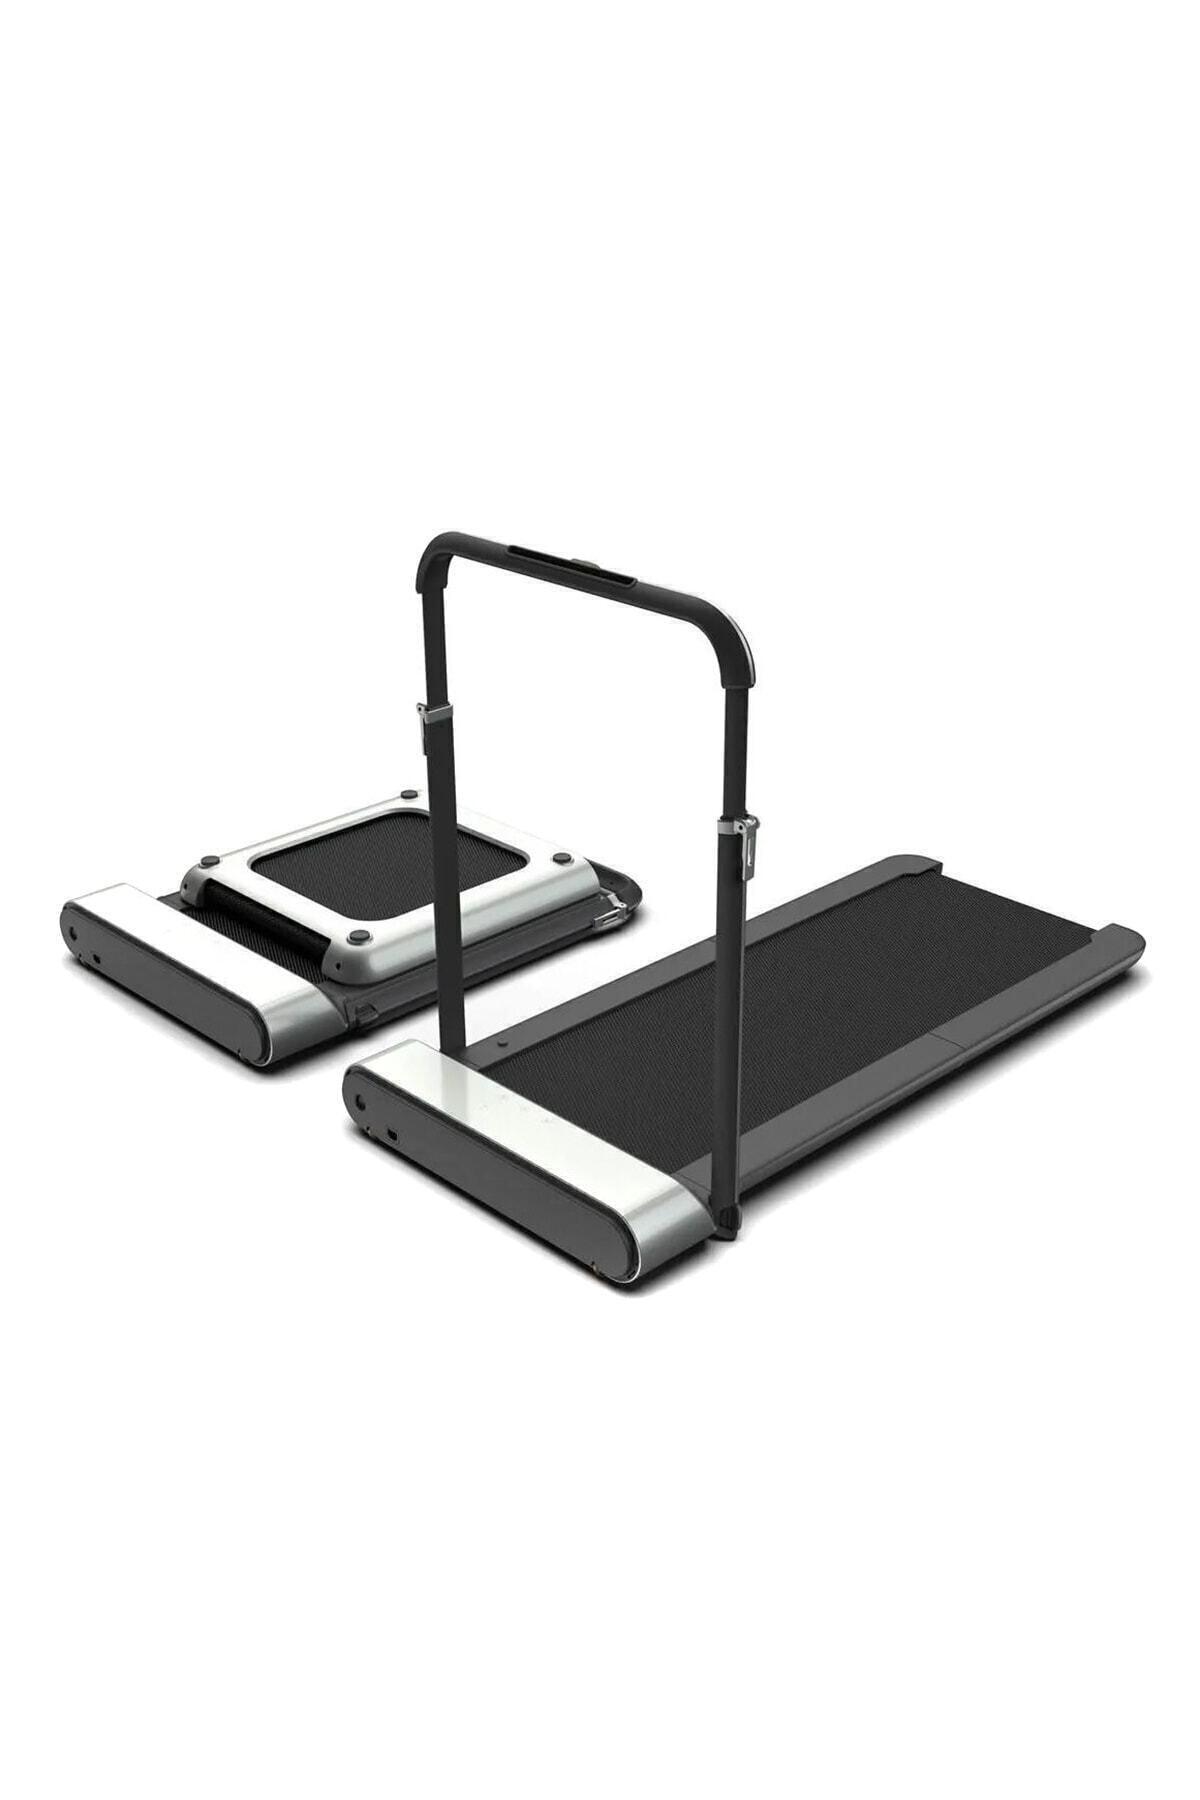 Walkingpad R1 Pro 1.25 Hp Katlanabilir Koşu Bandı